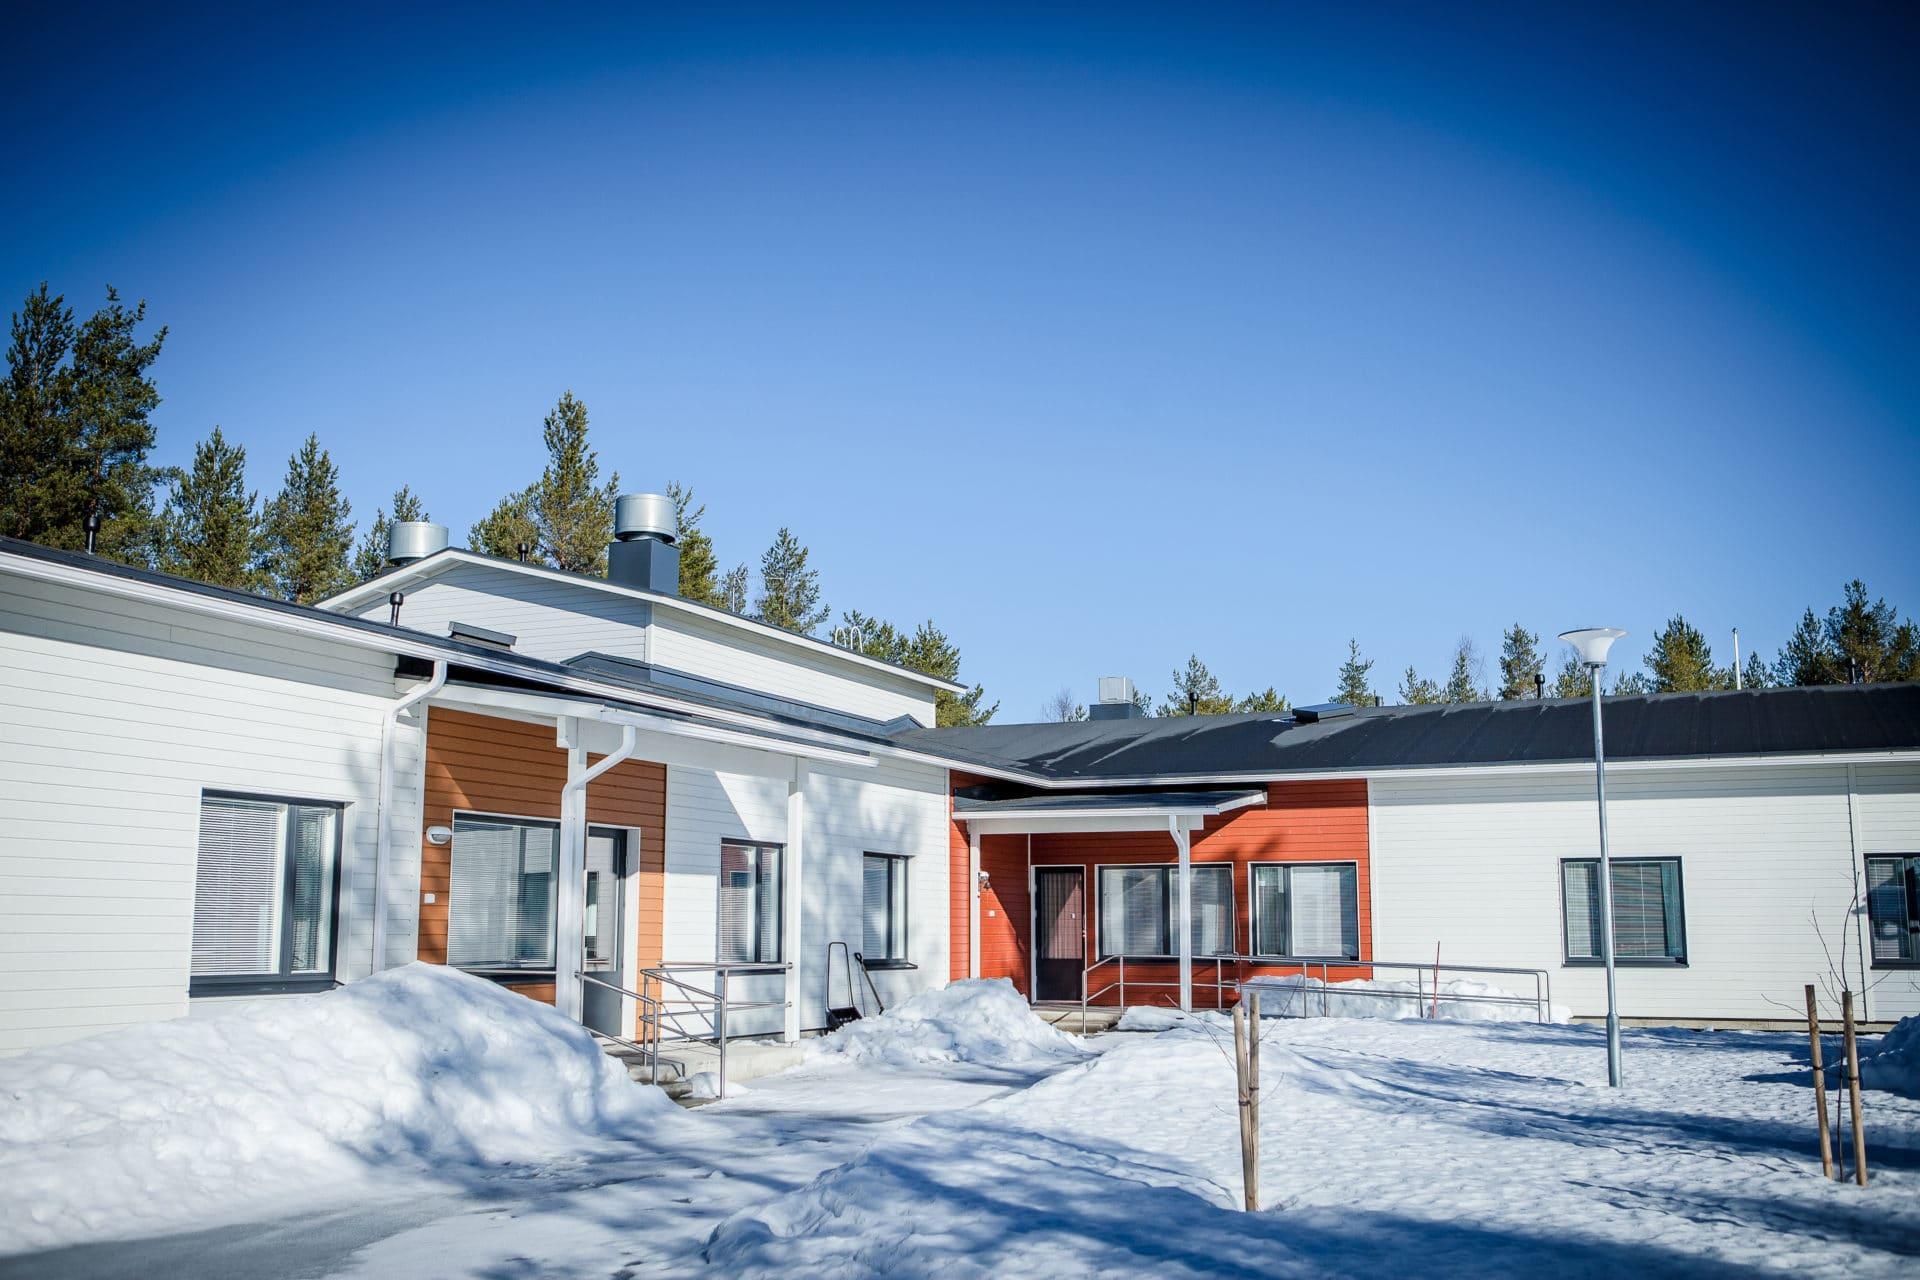 Hoivatilat Hoivakoti Oulu